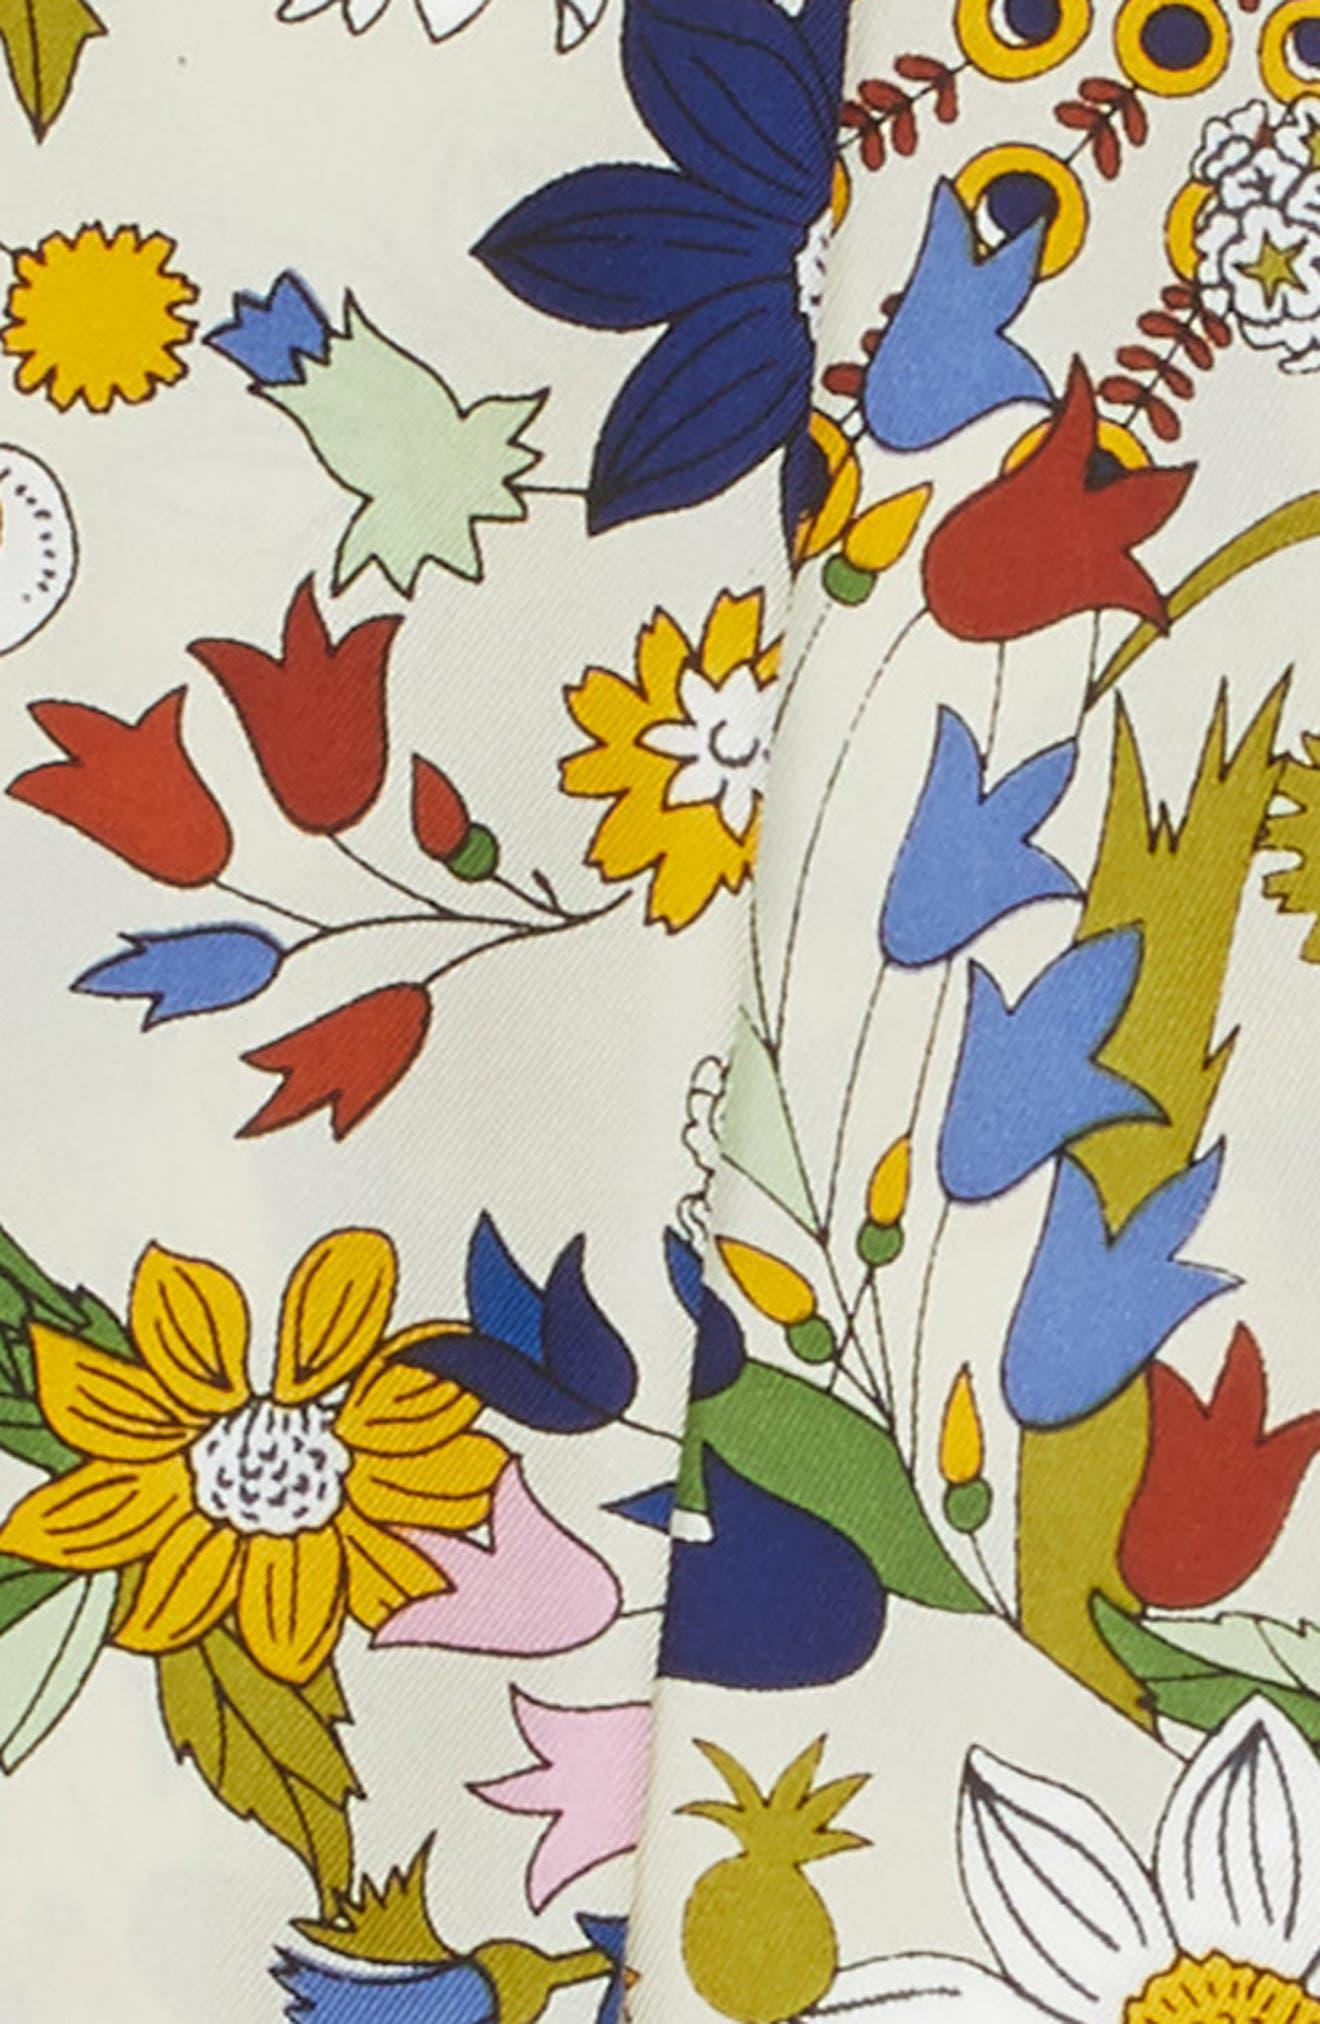 Meadow Folly Silk Twill Scarf,                             Alternate thumbnail 4, color,                             Ivory Meadow Folly